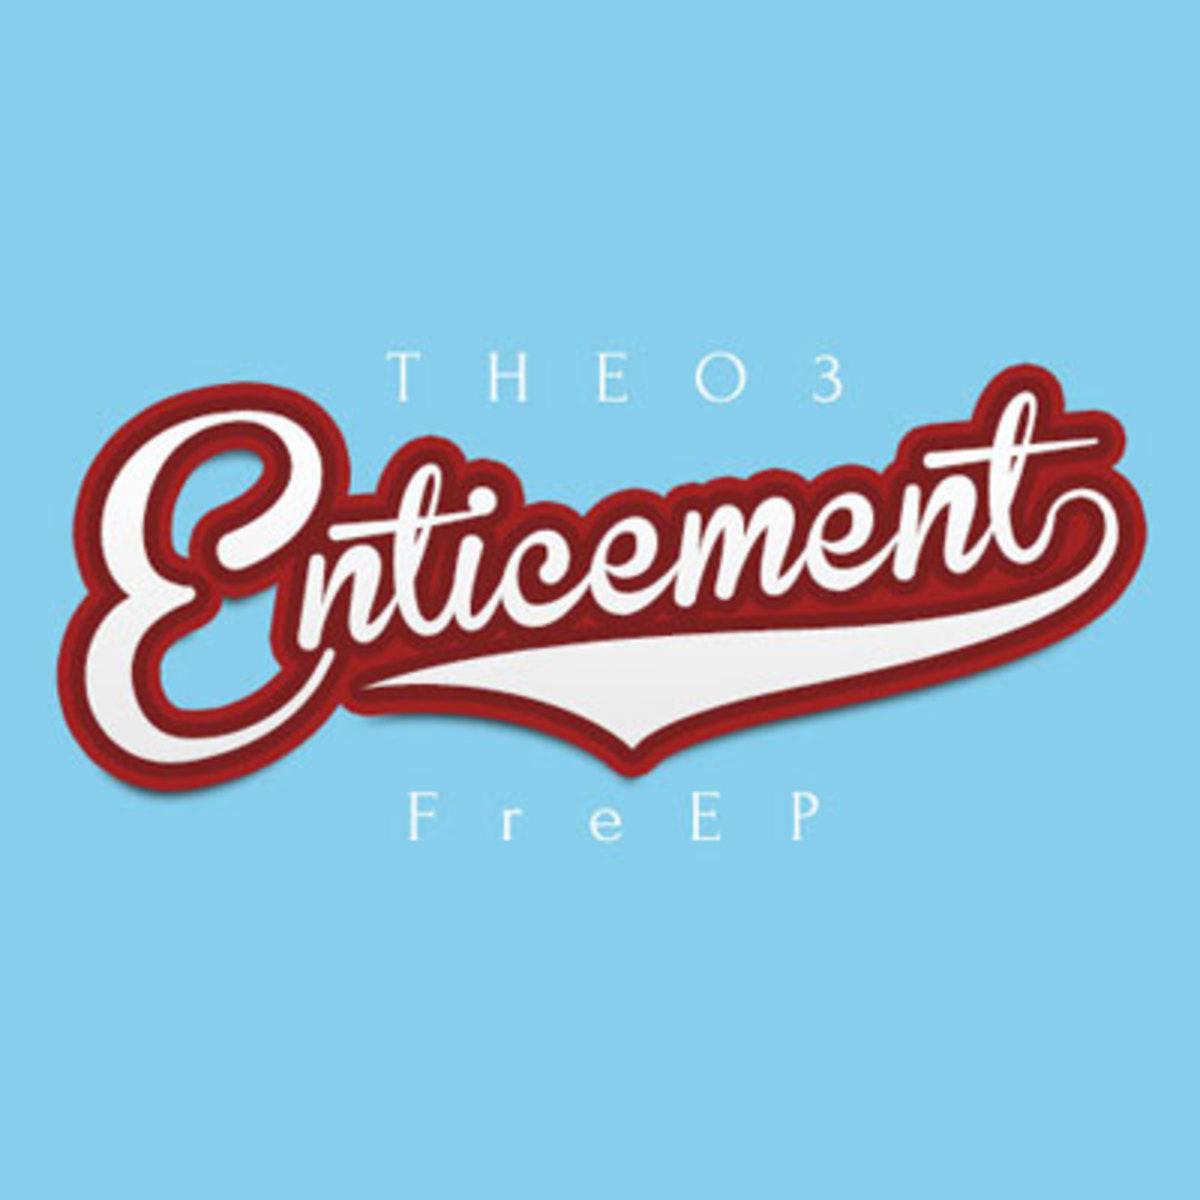 theo3-enticement.jpg